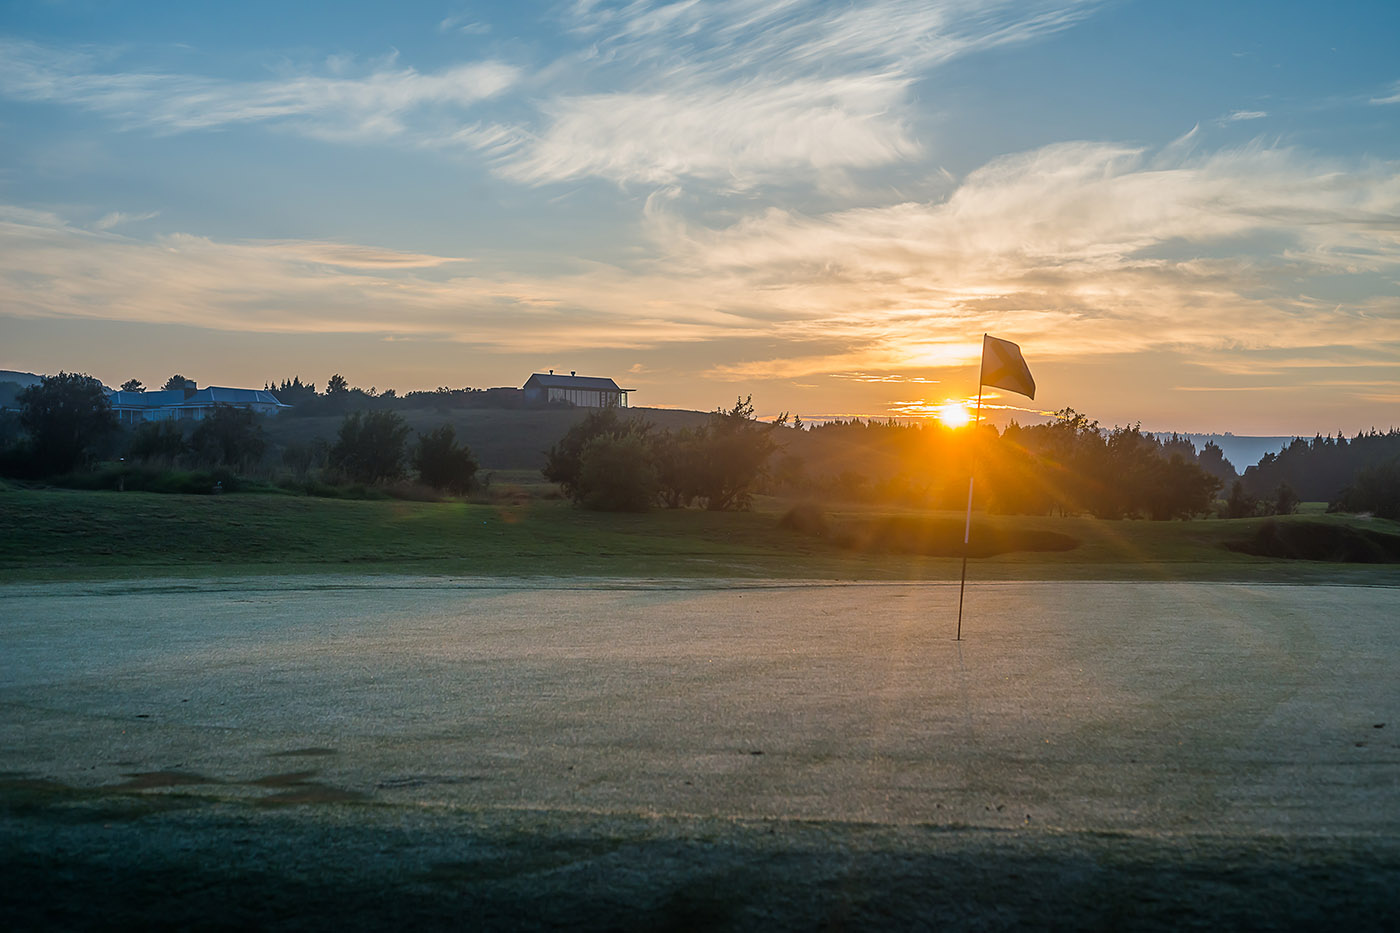 golf-gallery-gowrie-farm-country-getaway-golf-estate-kzn